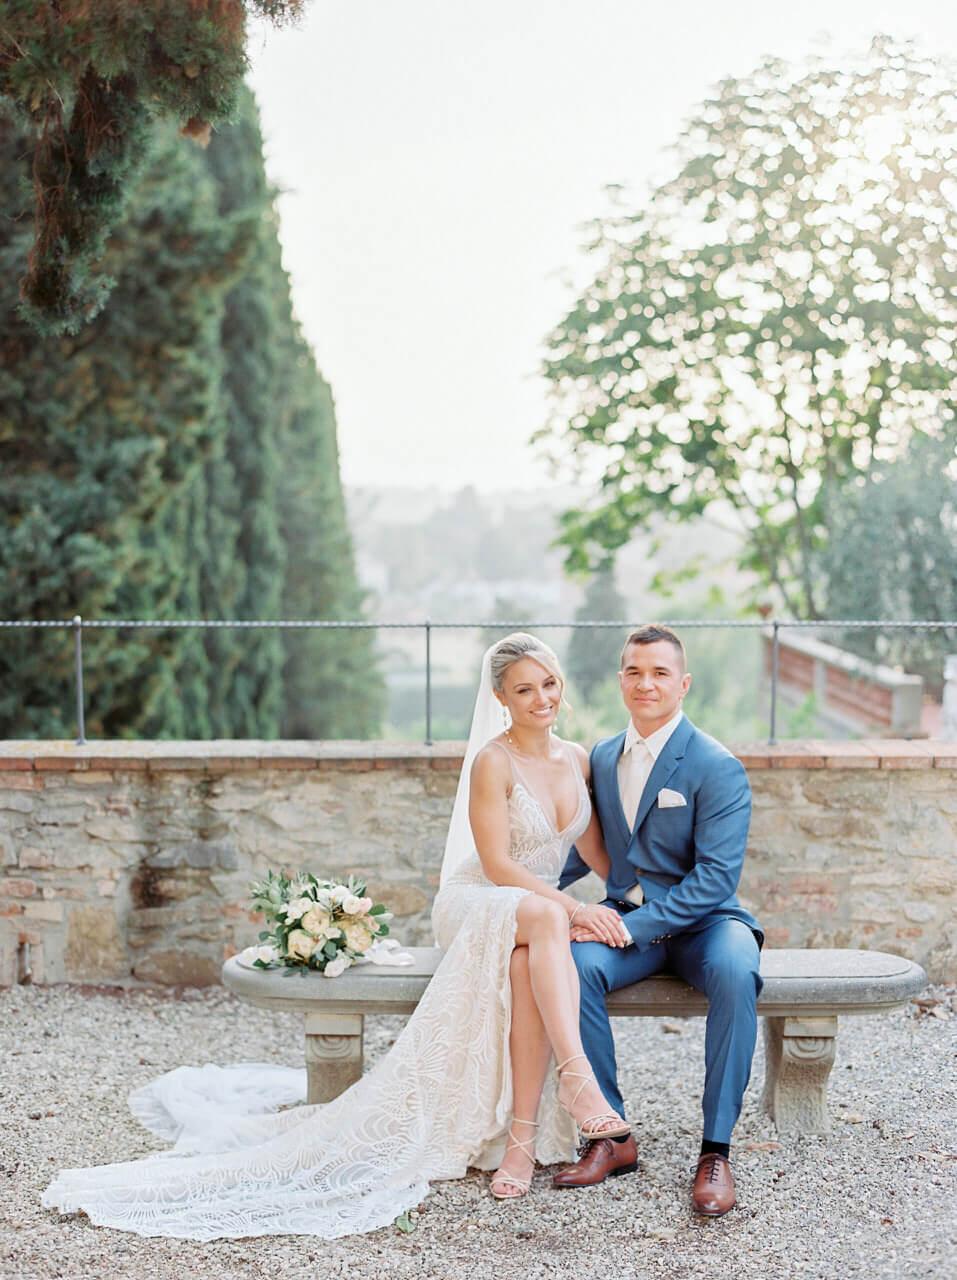 Bridal portrait in an Italian garden - Villa agape